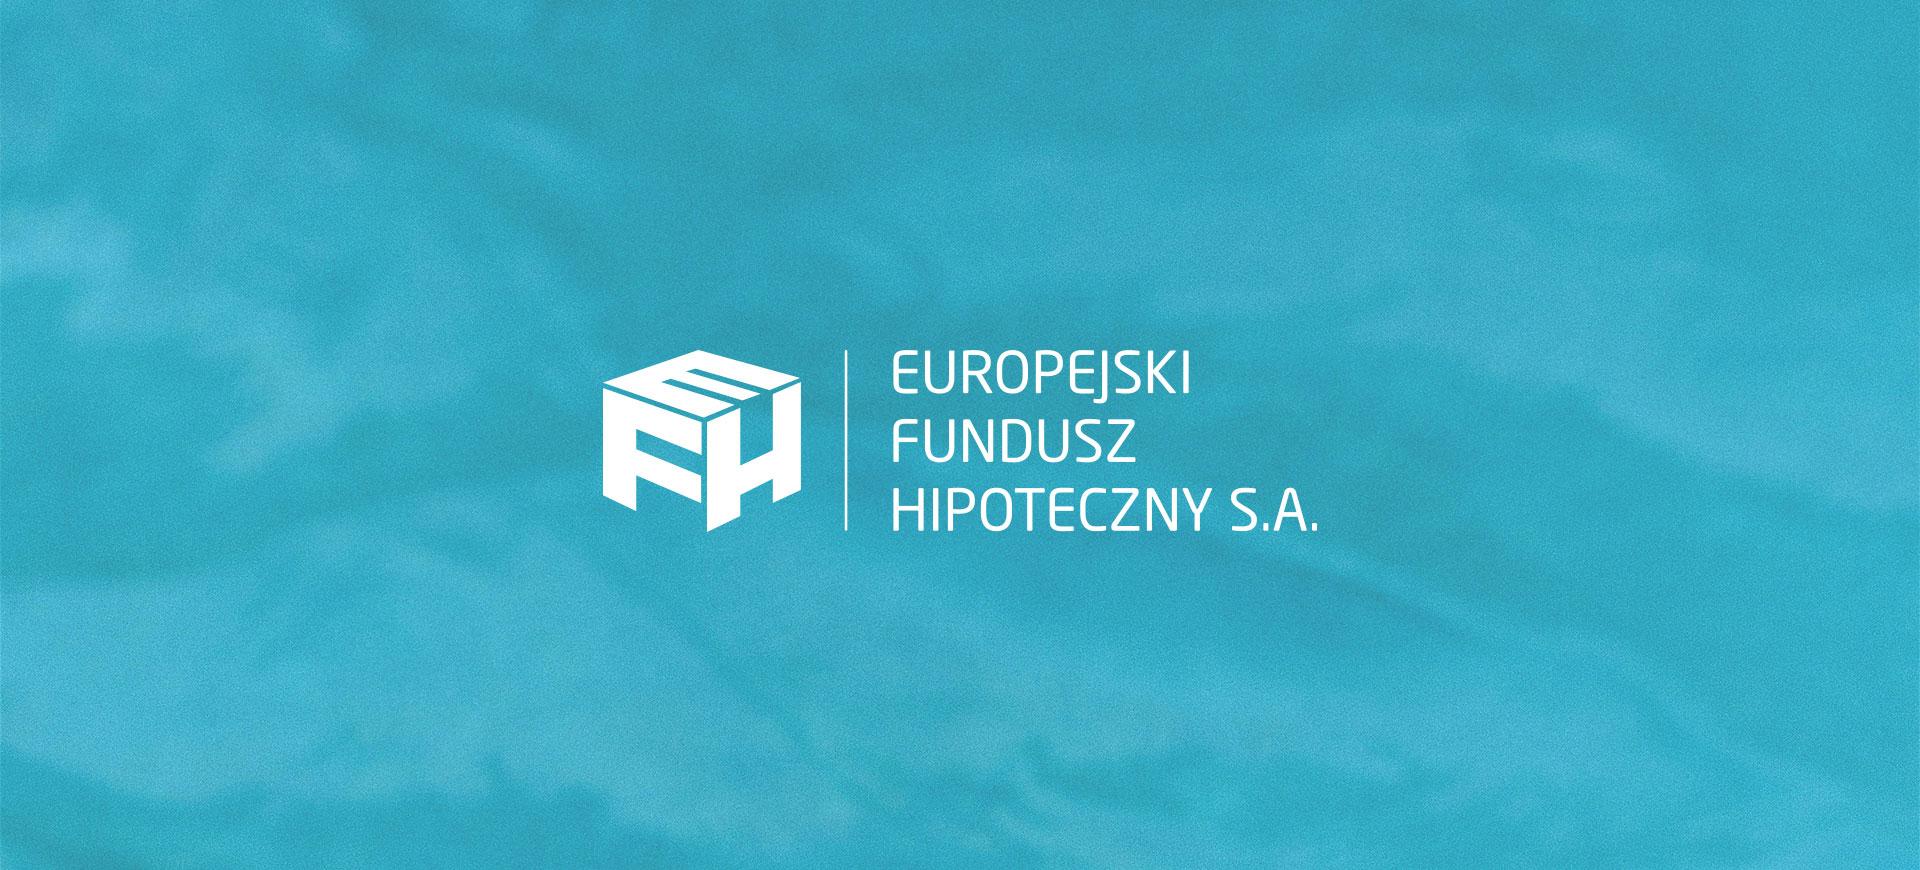 EFH - nasz klient - projekty EMENEM studio